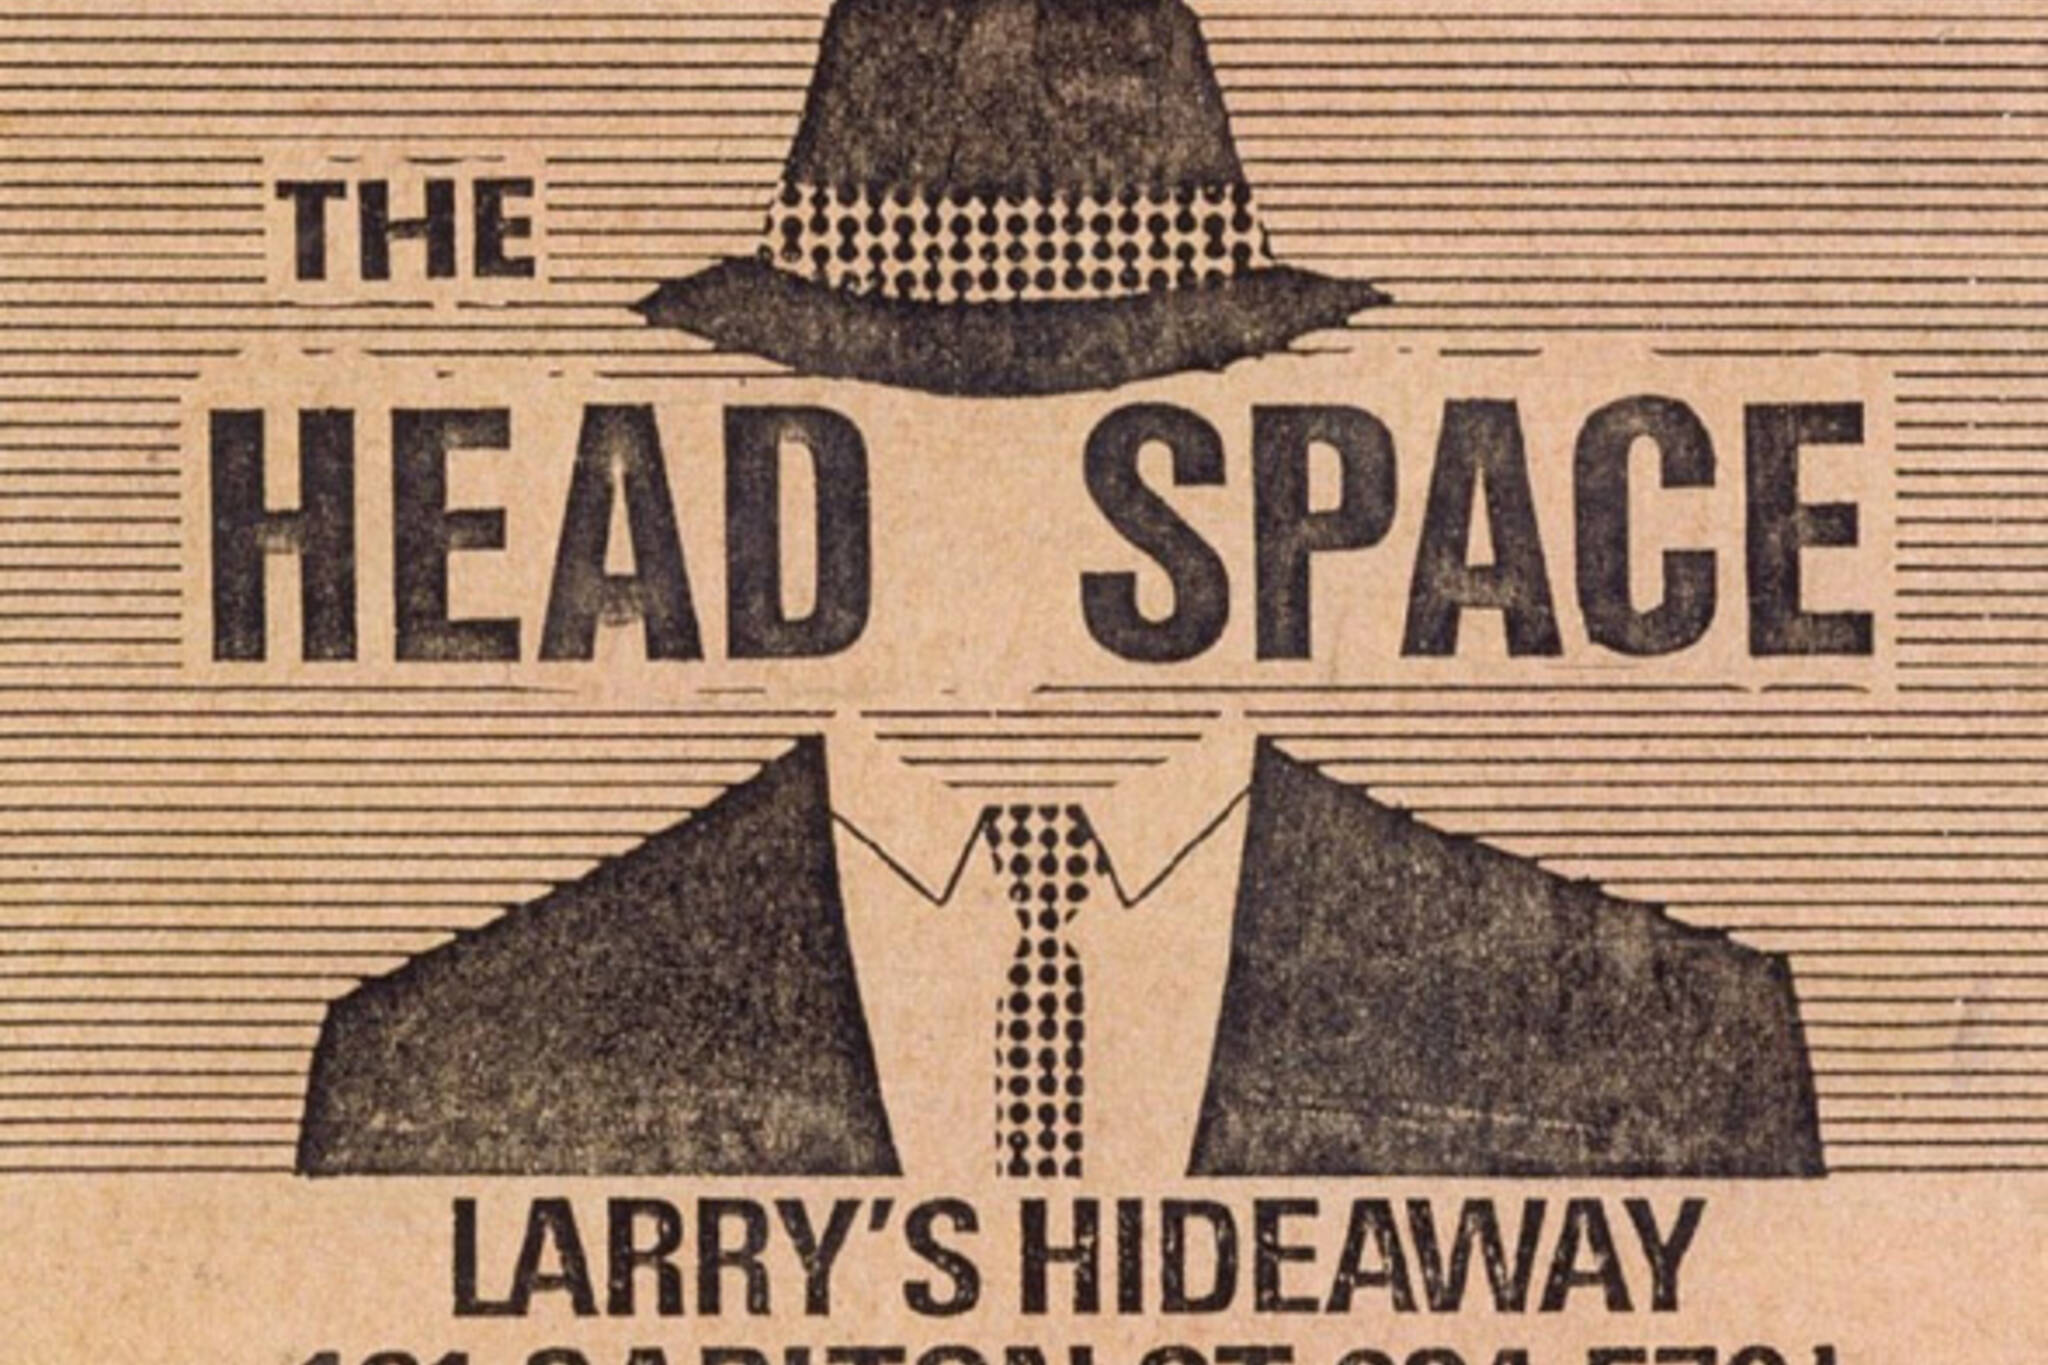 Headspace Bar Toronto